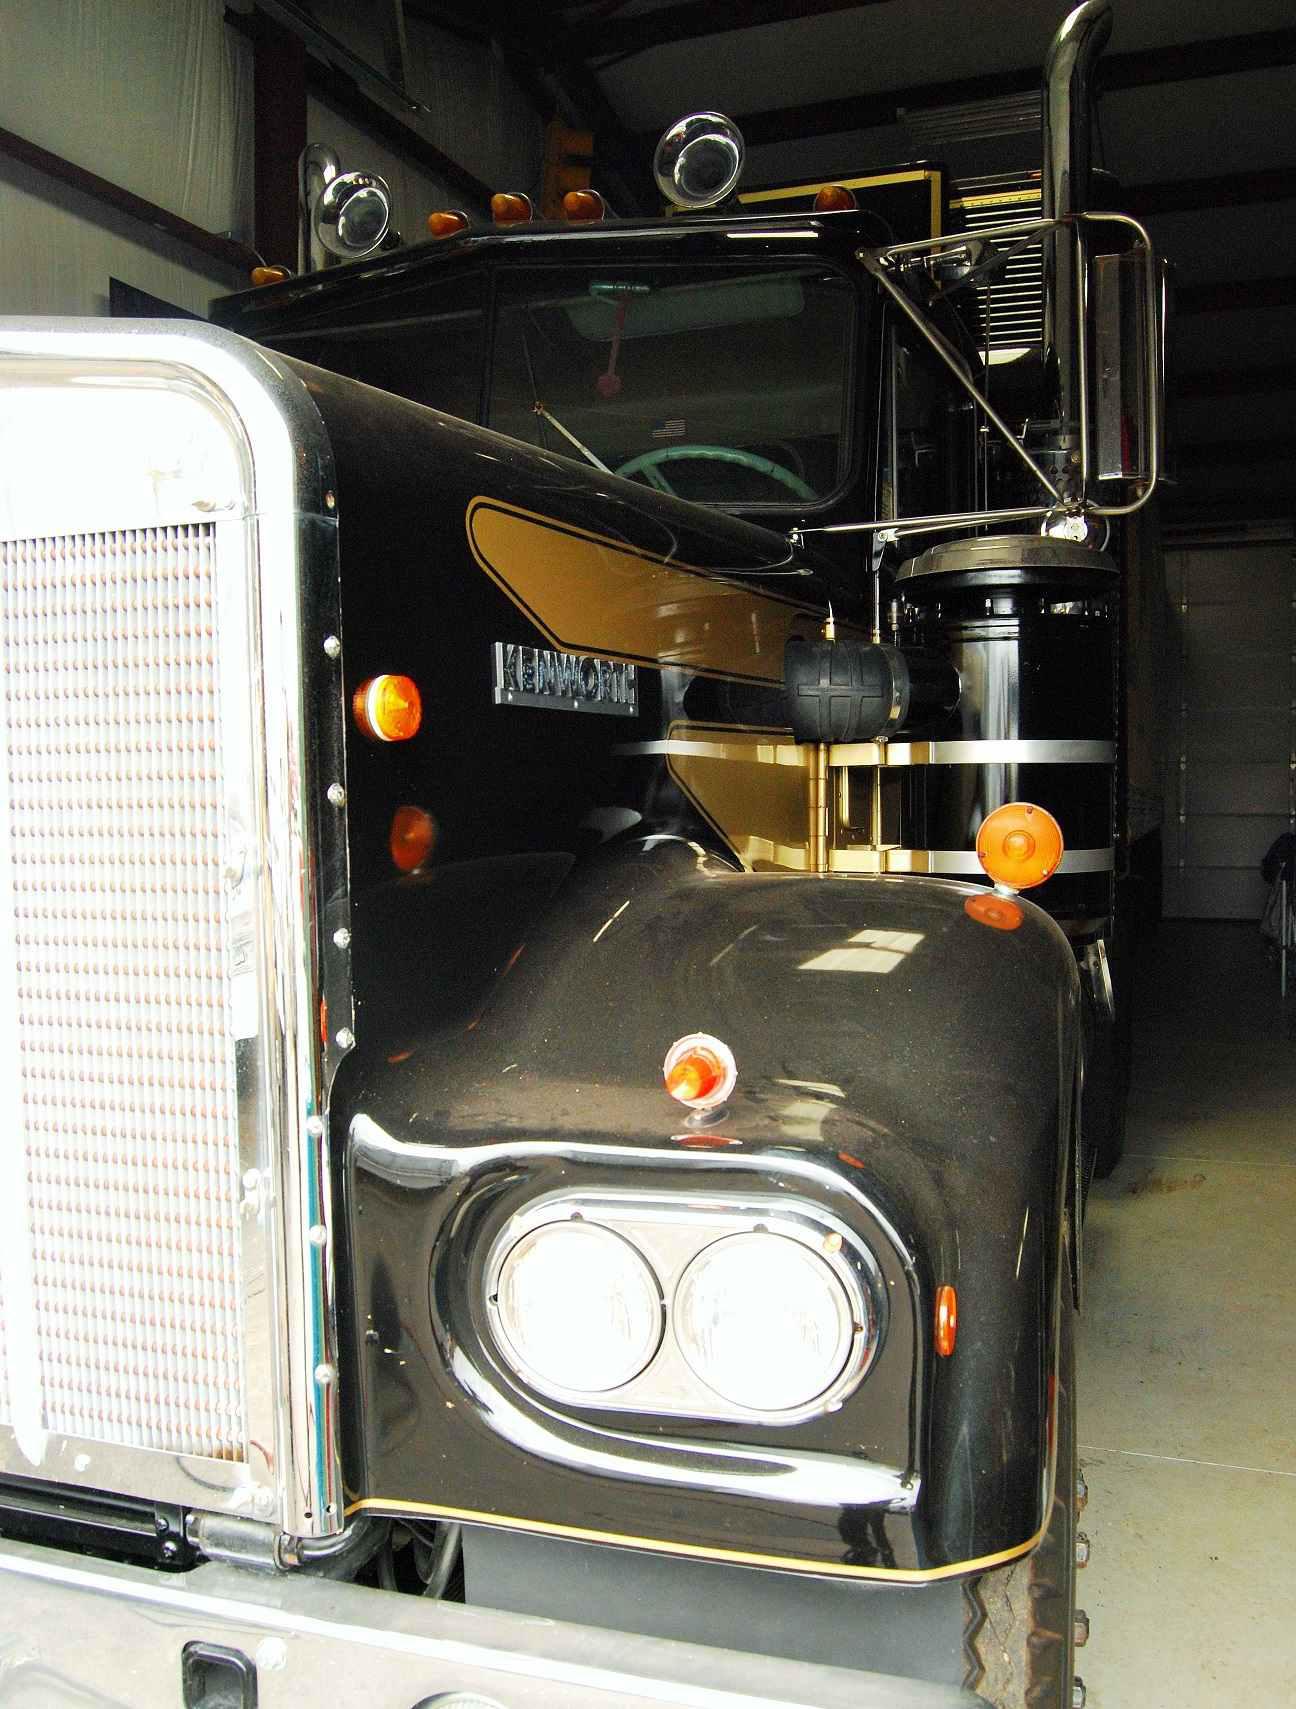 Classic former Burt Reynolds-owned W900B, across the pond